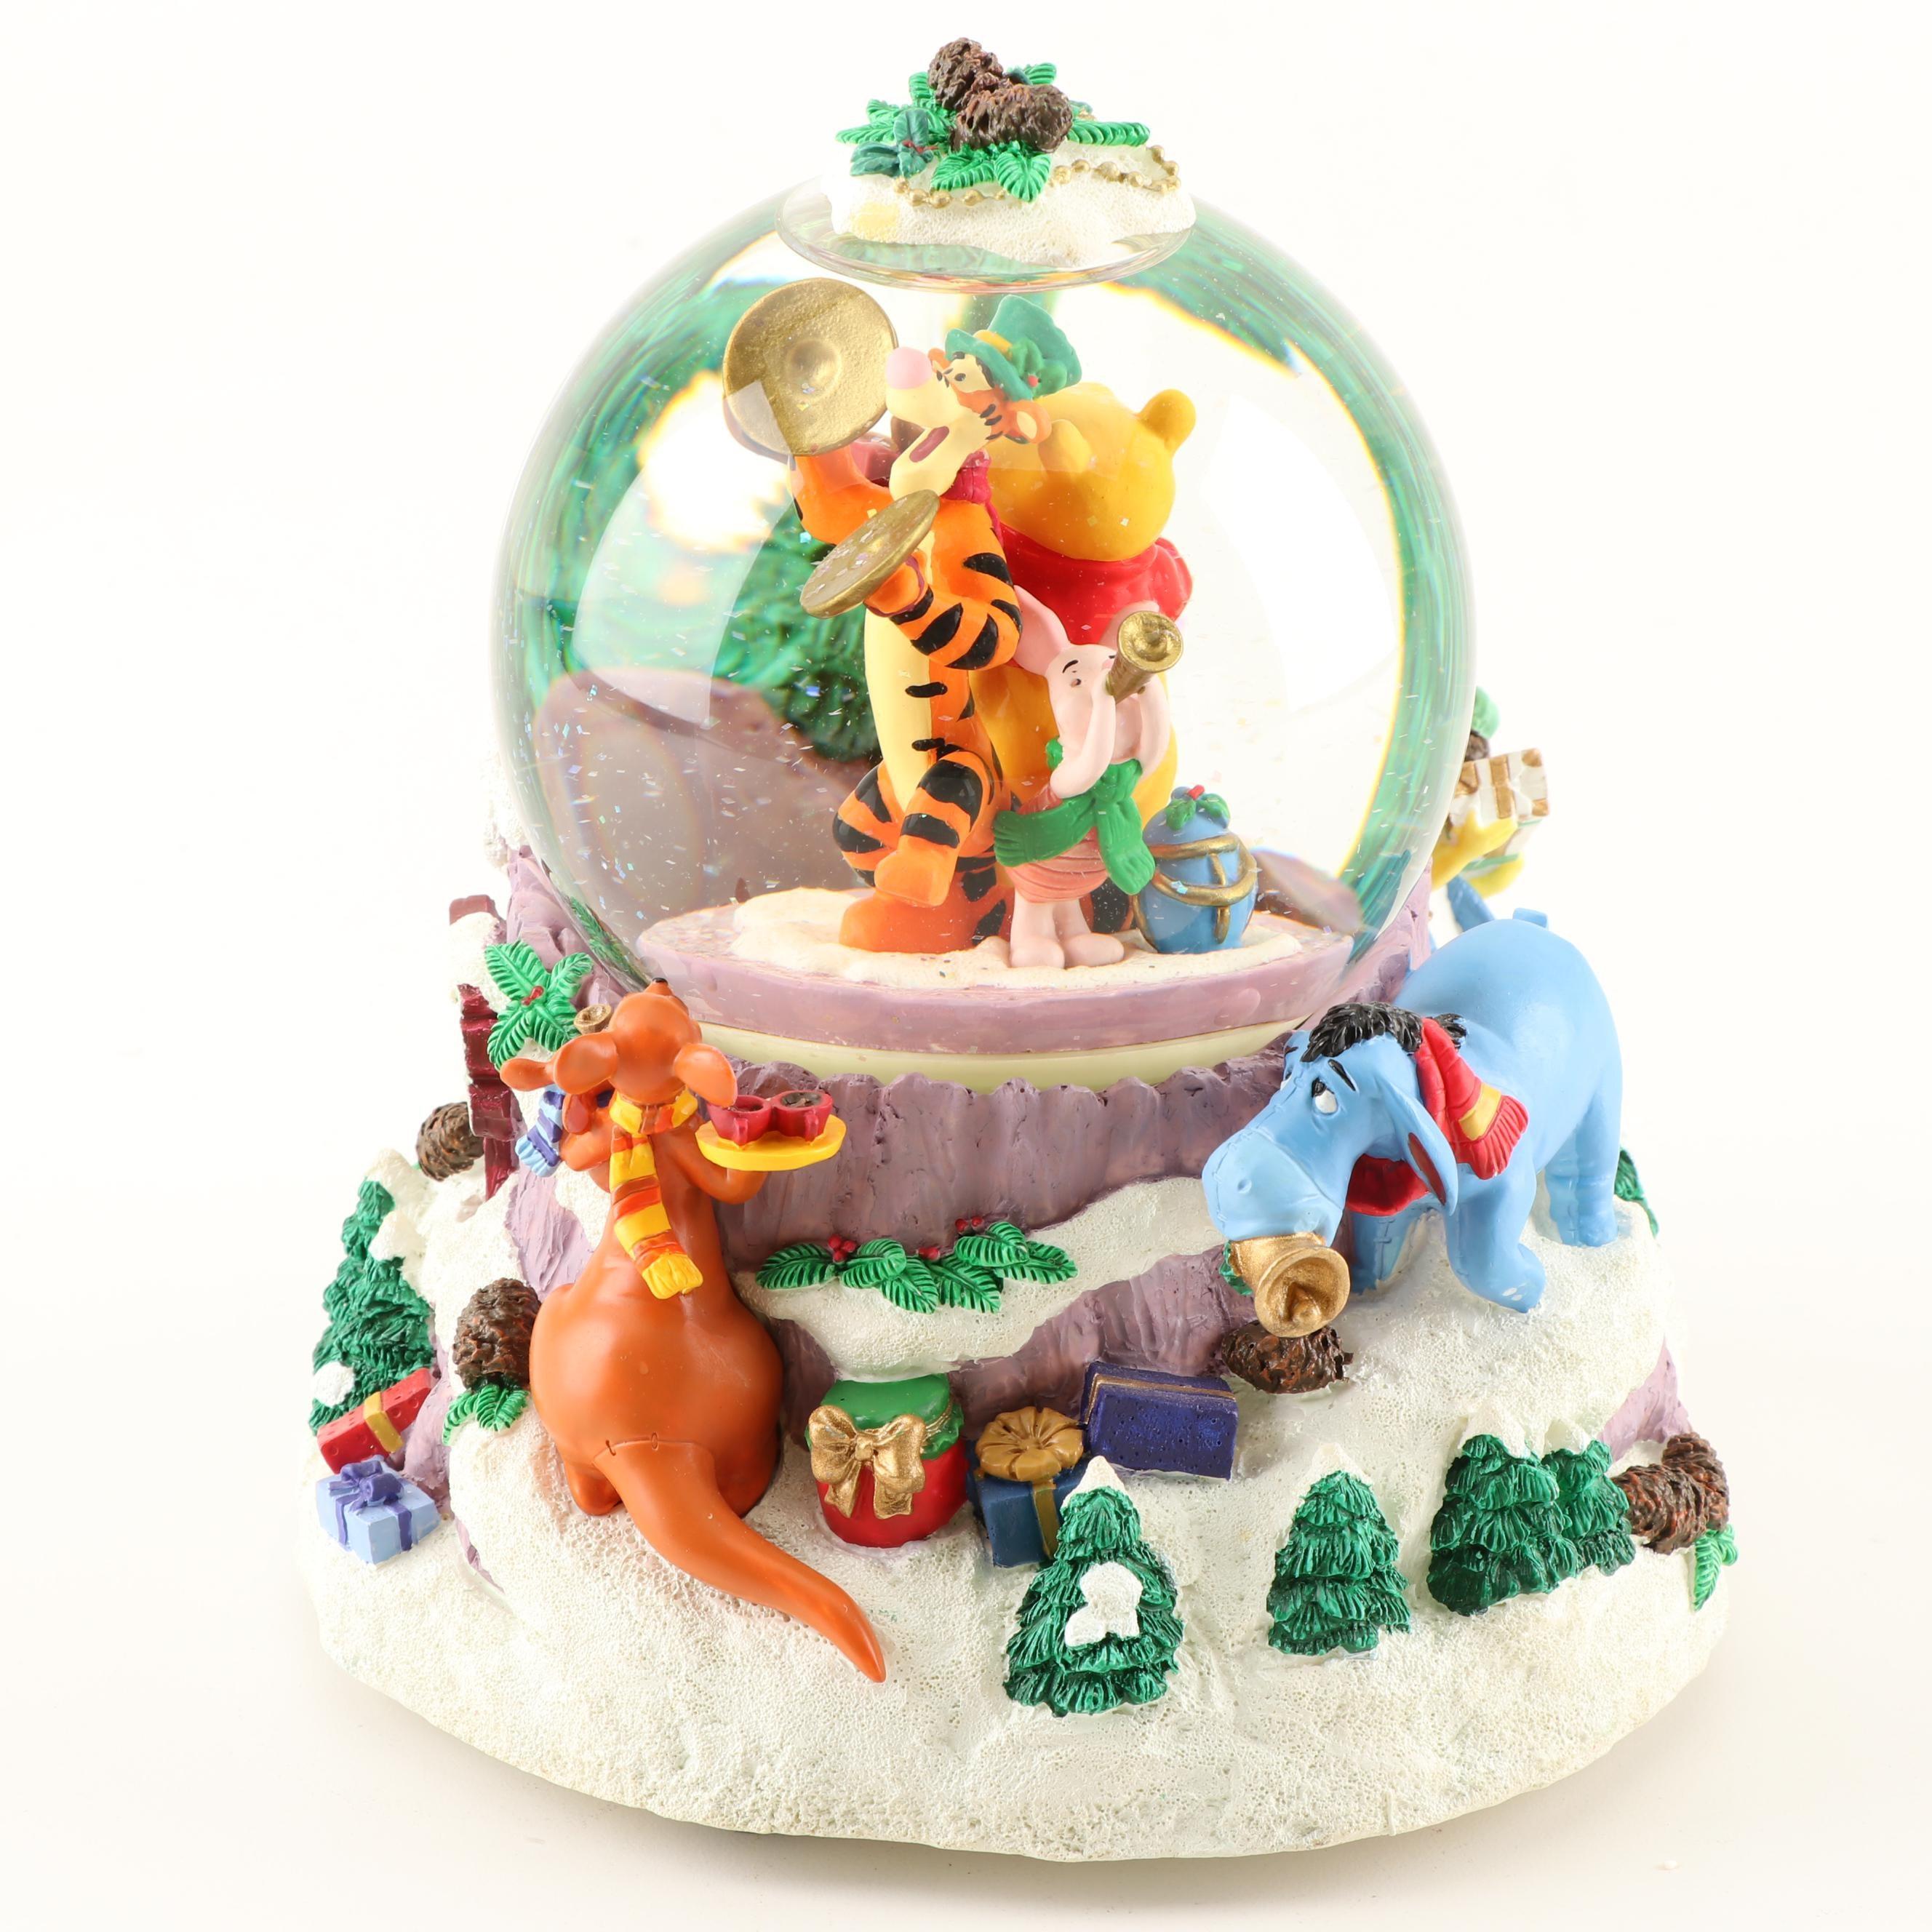 "Disney Winnie The Pooh Snow Globe ""We Wish You A Merry Christmas"" Music Box"